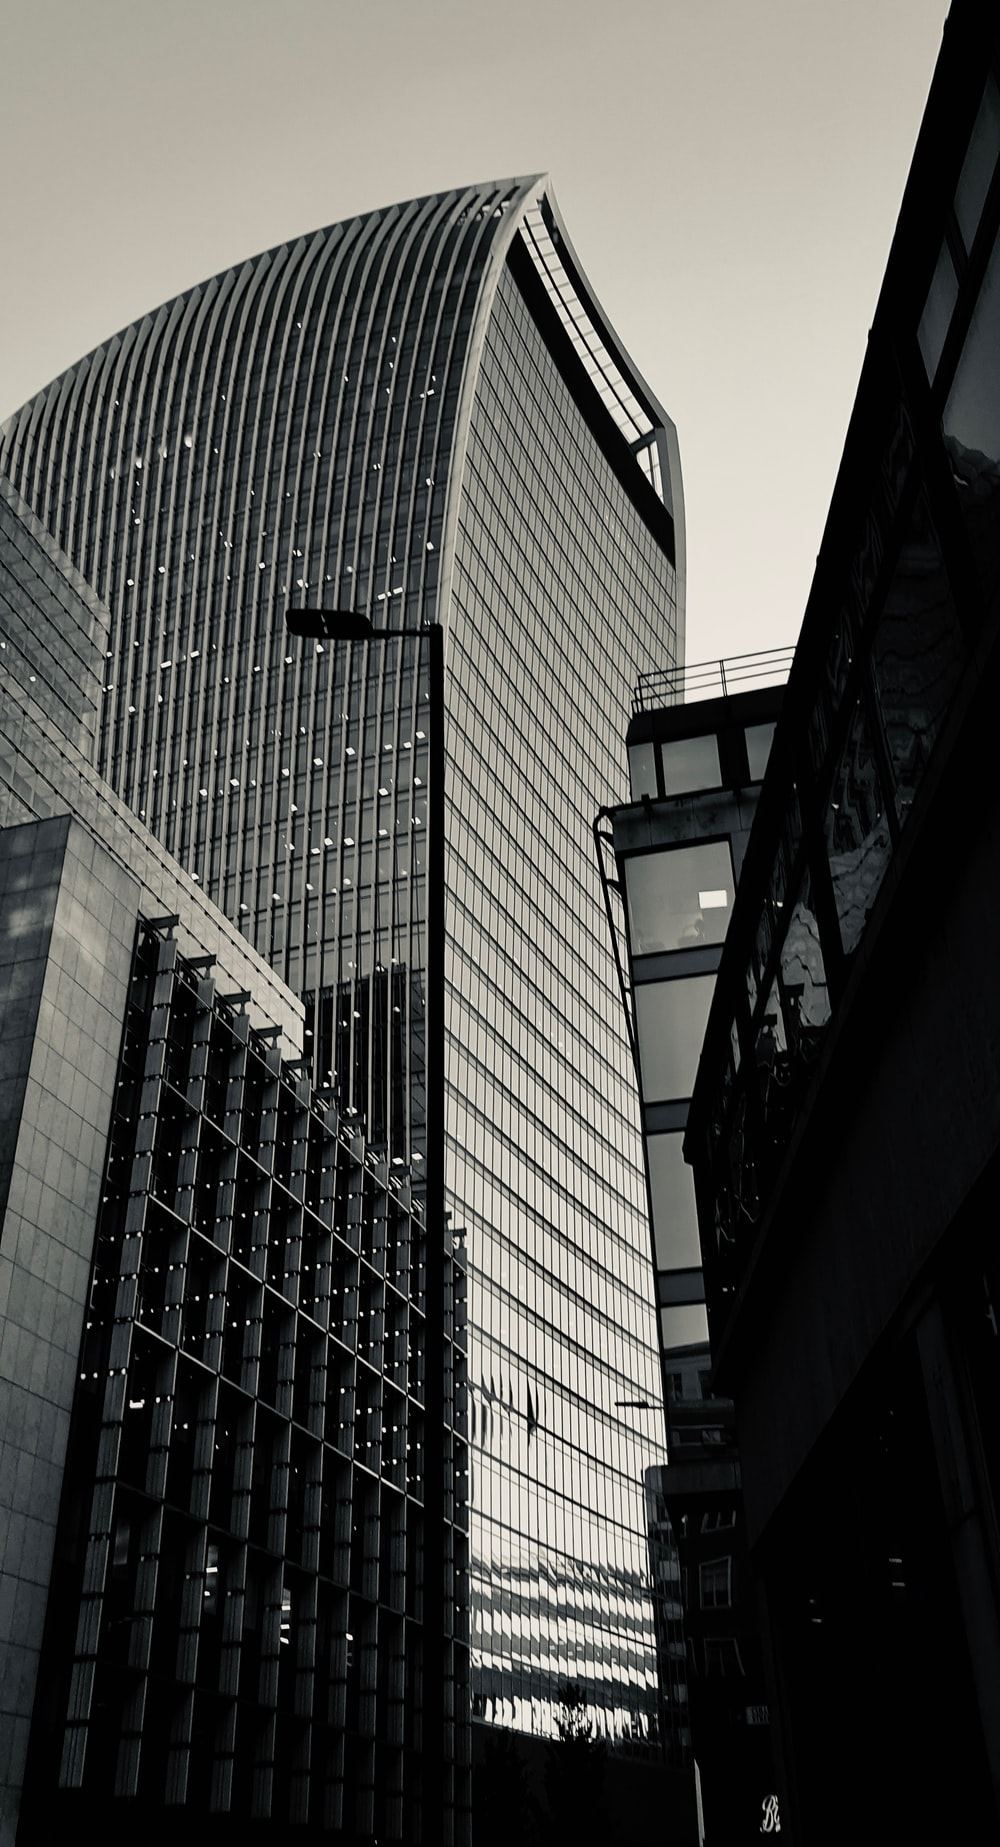 curtain wall high-rise building